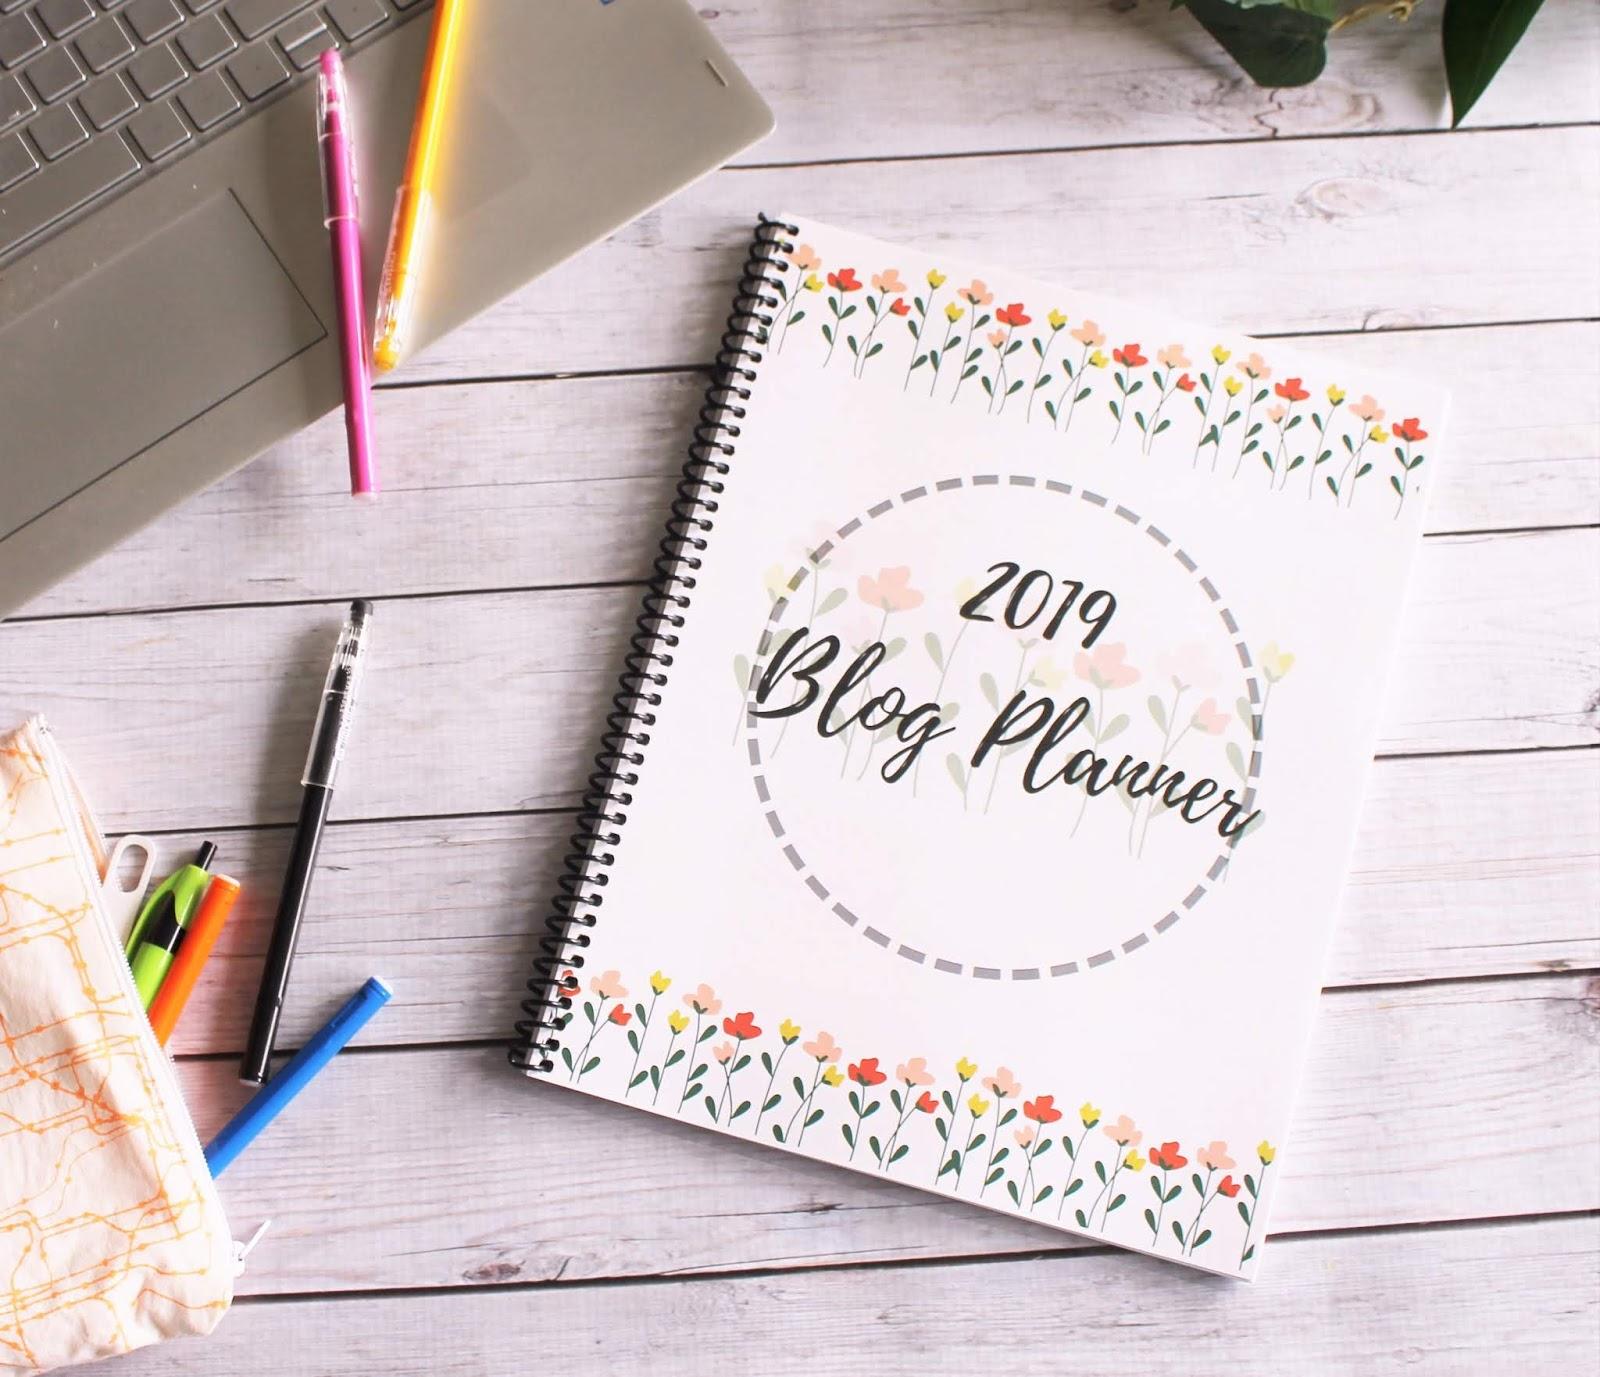 picture regarding Blog Planner Template identify 2019 Site Planner Sew Basic Residence